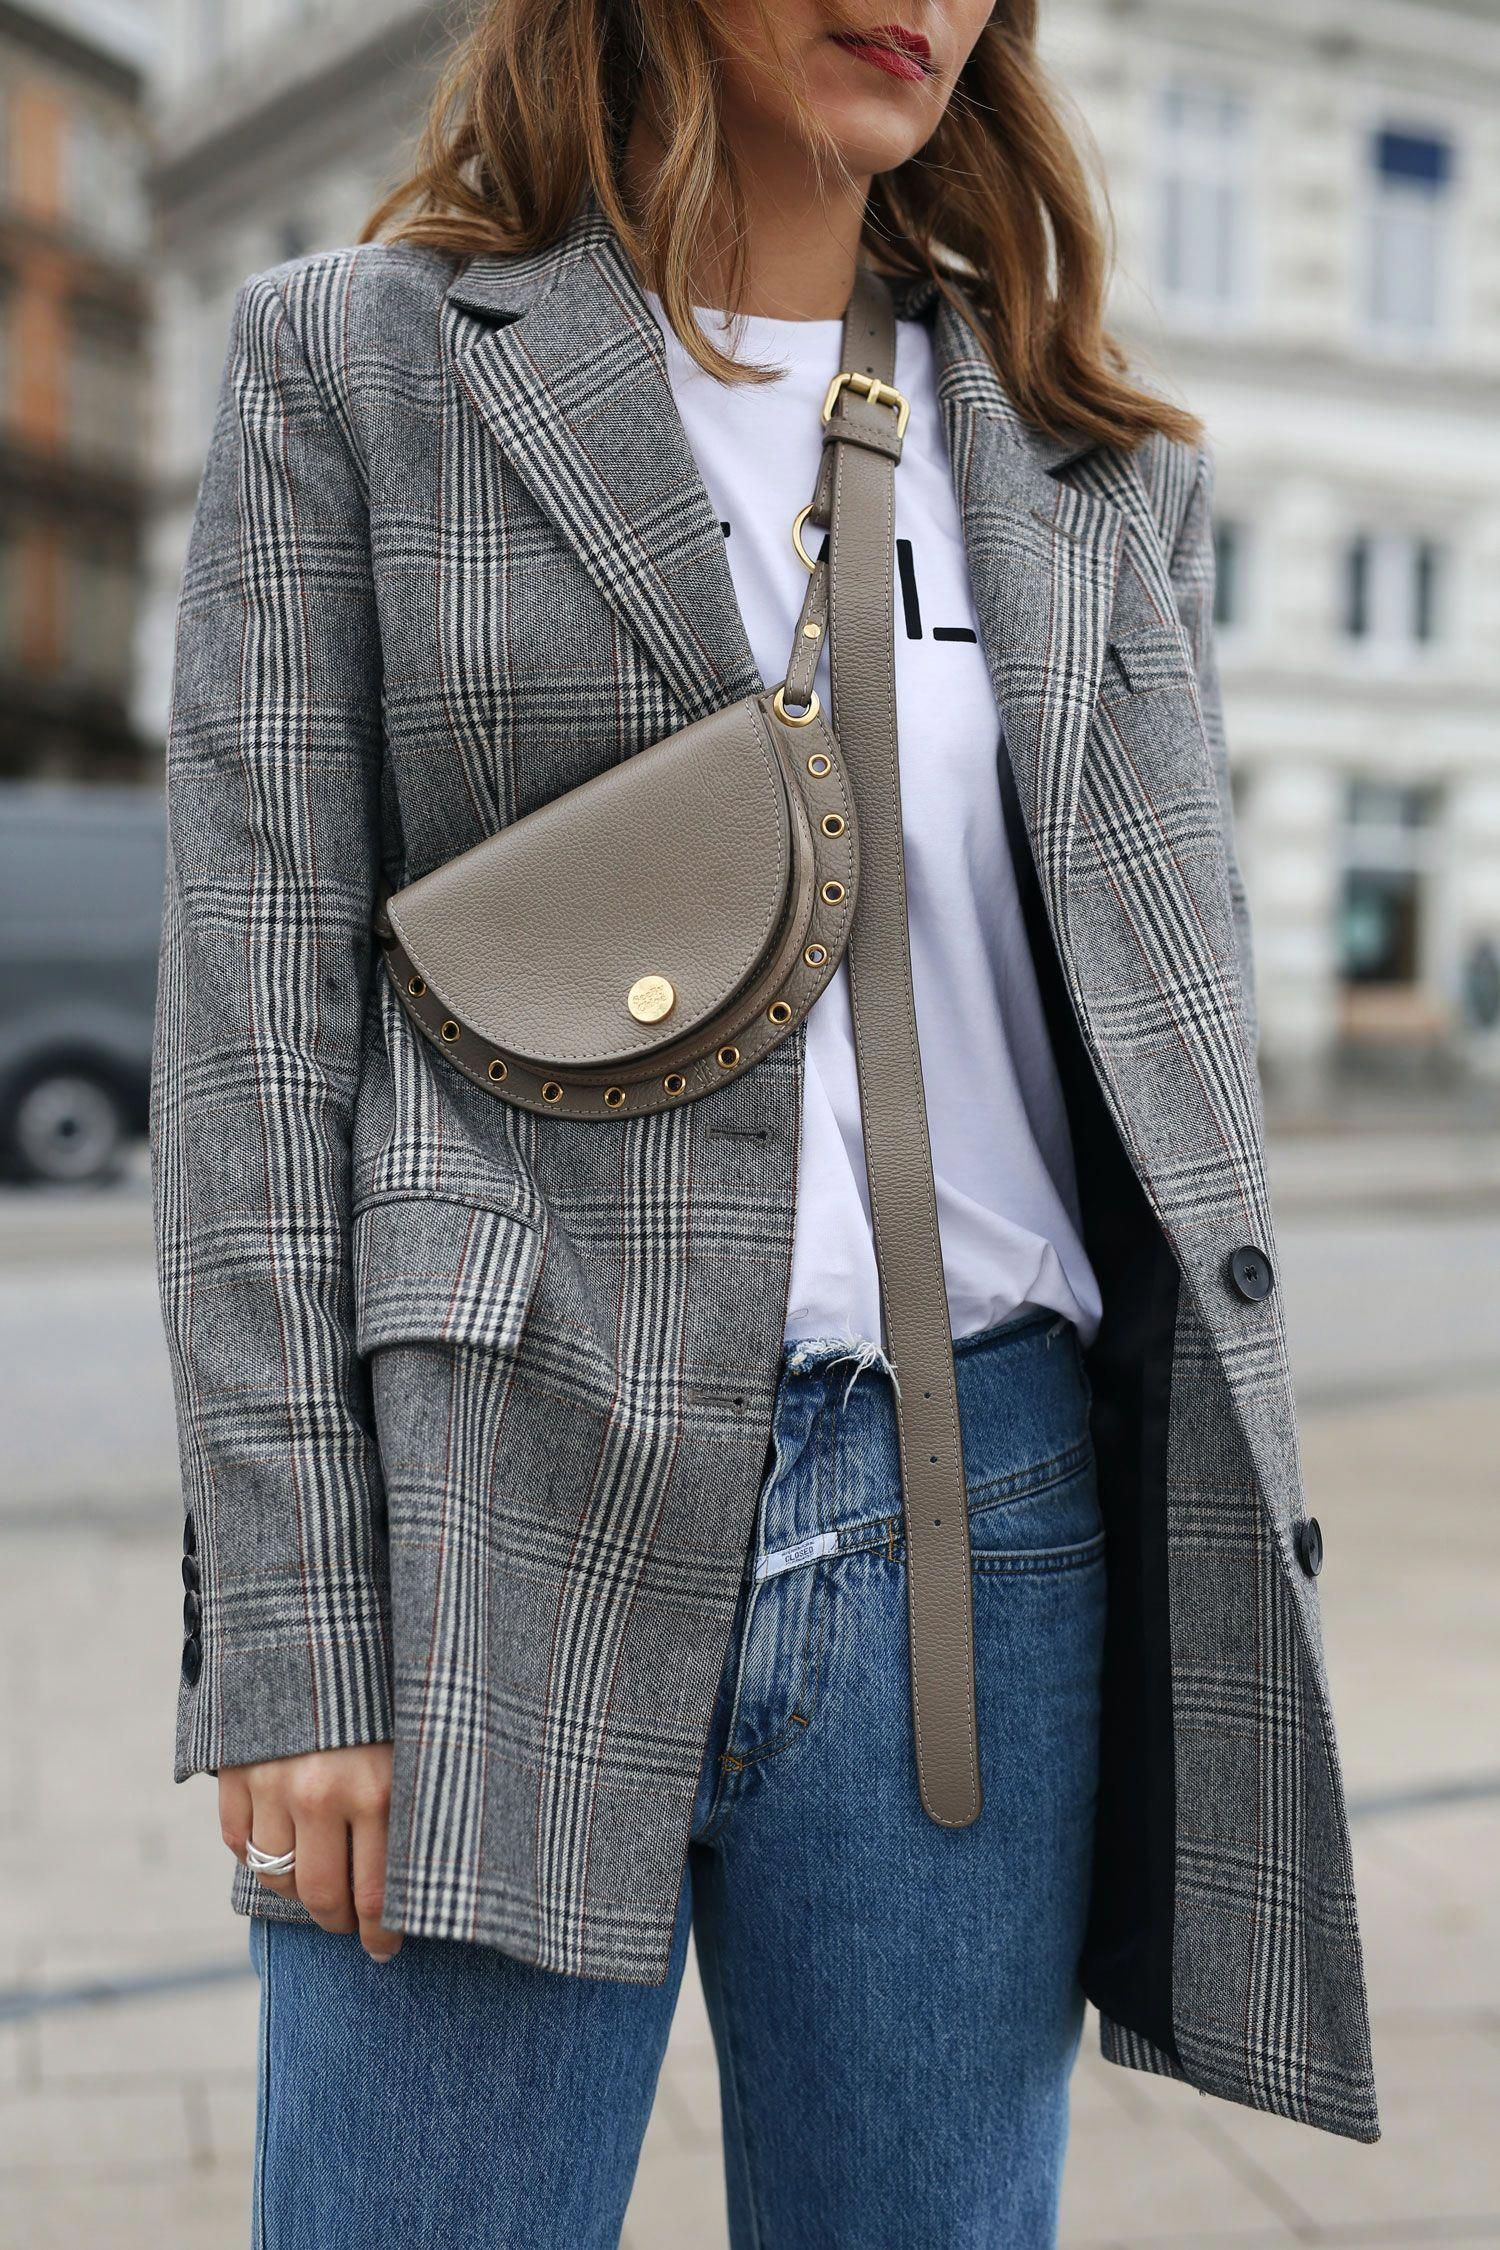 business attire for women #BUSINESSATTIRE #businessattiresummer business attire for women #BUSINESSATTIRE #womensbusinessattire